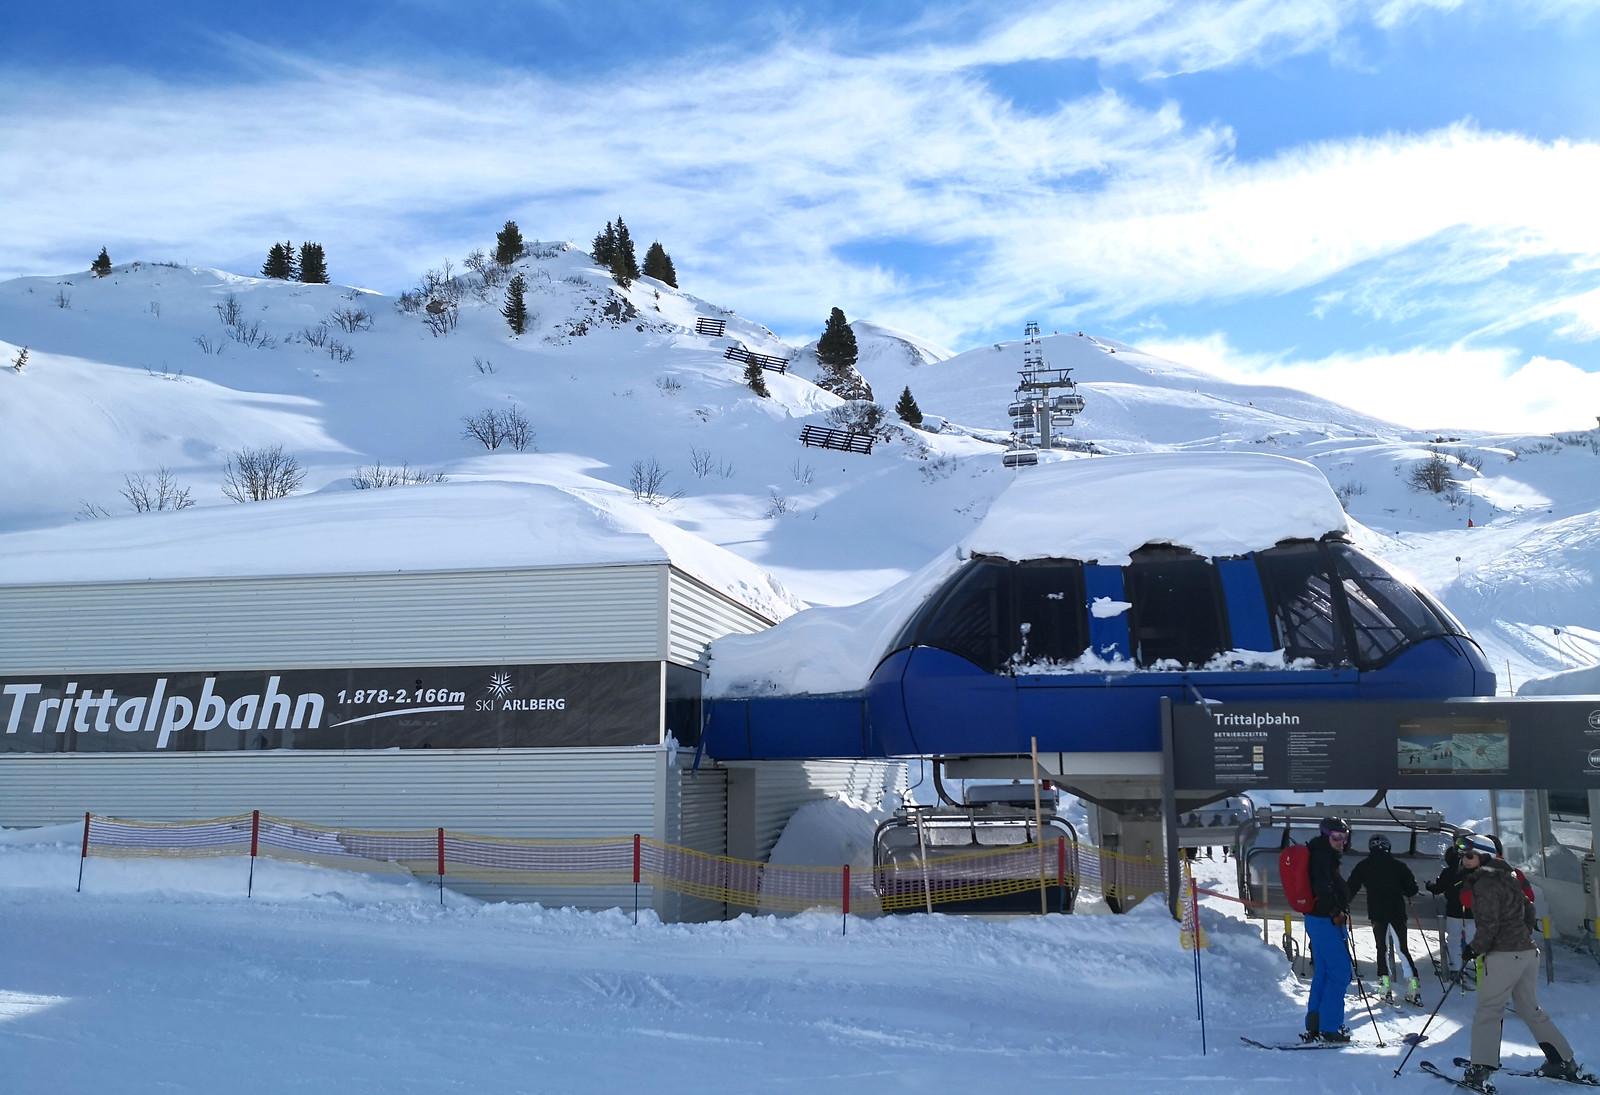 Base of Trittalpbahn